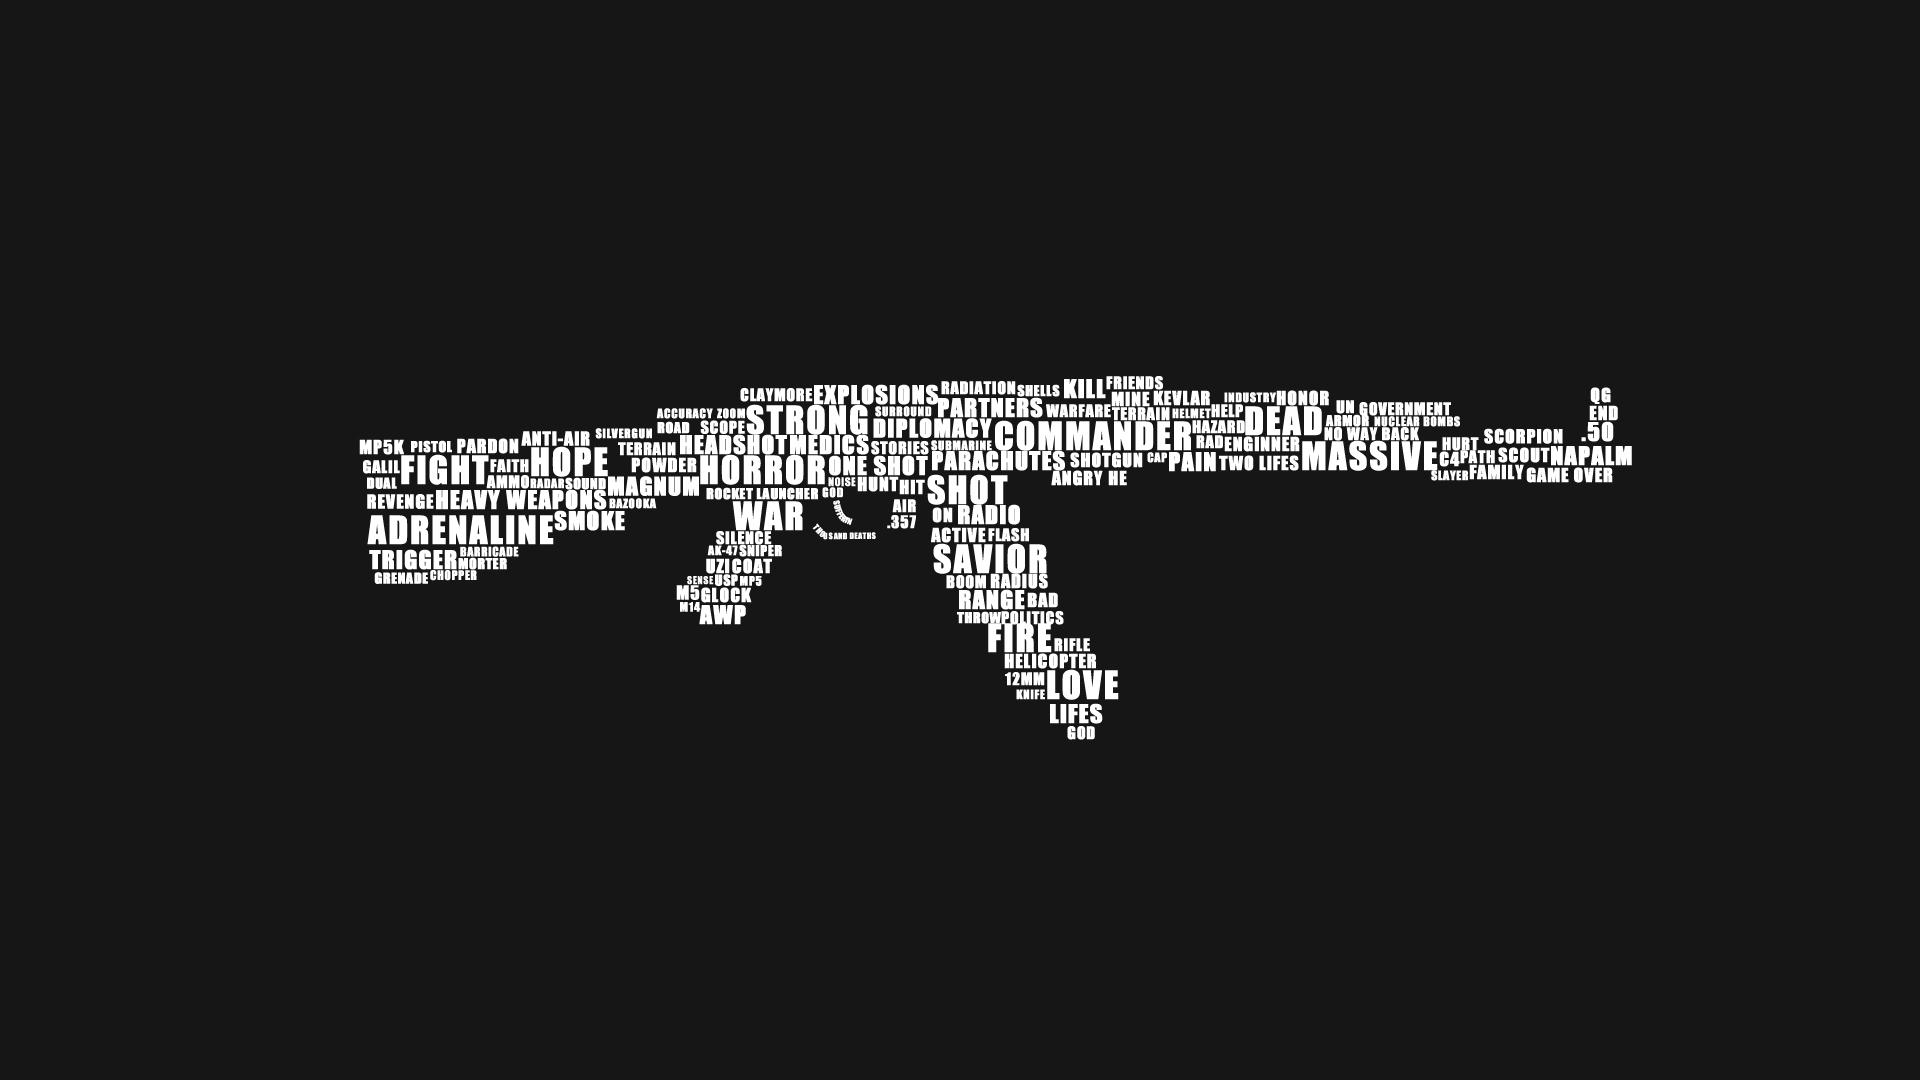 AK 47 wallpaper by blinkit desktop wallpaper and make this wallpaper 1920x1080